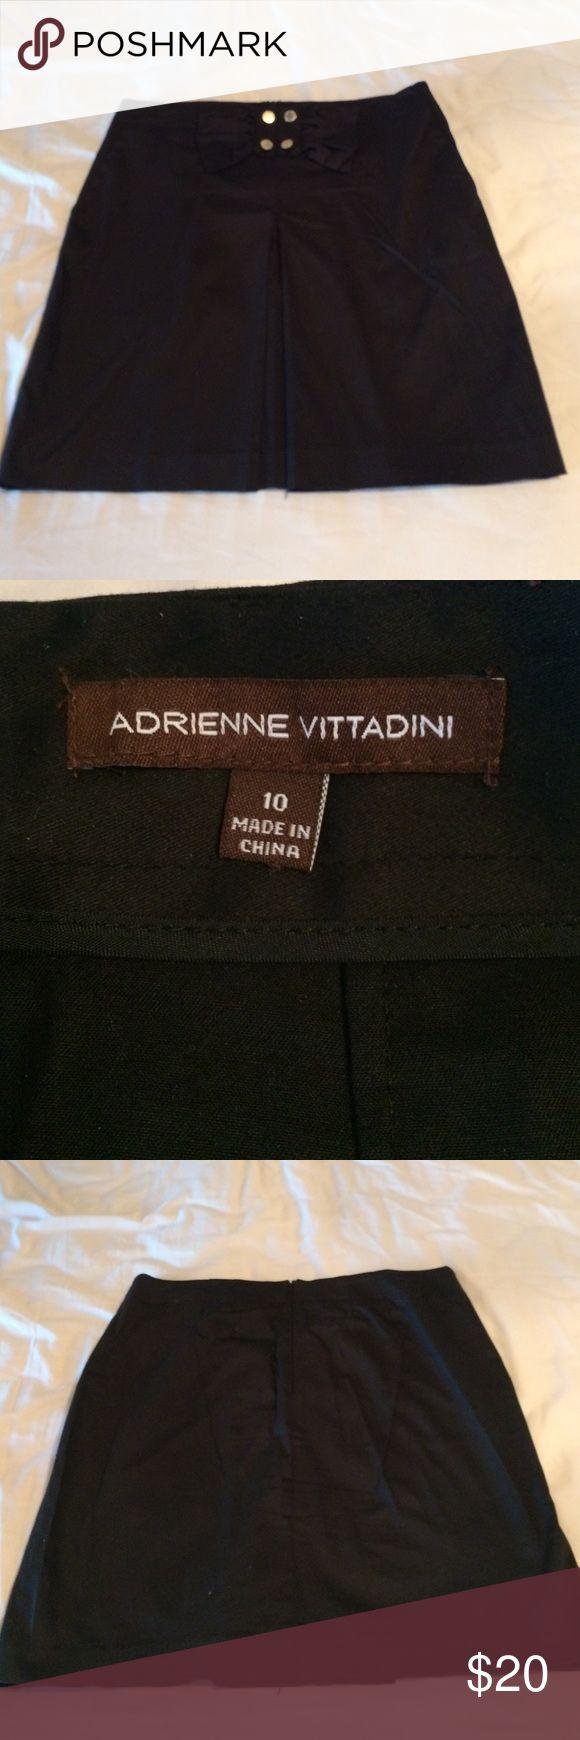 Adrienne vittadini size 10 black skirt Cute Adrienne Vittadini black skirt with gold hardware.   Machine wash cold.  Size 10 new without tag. Adrienne Vittadini Skirts Midi